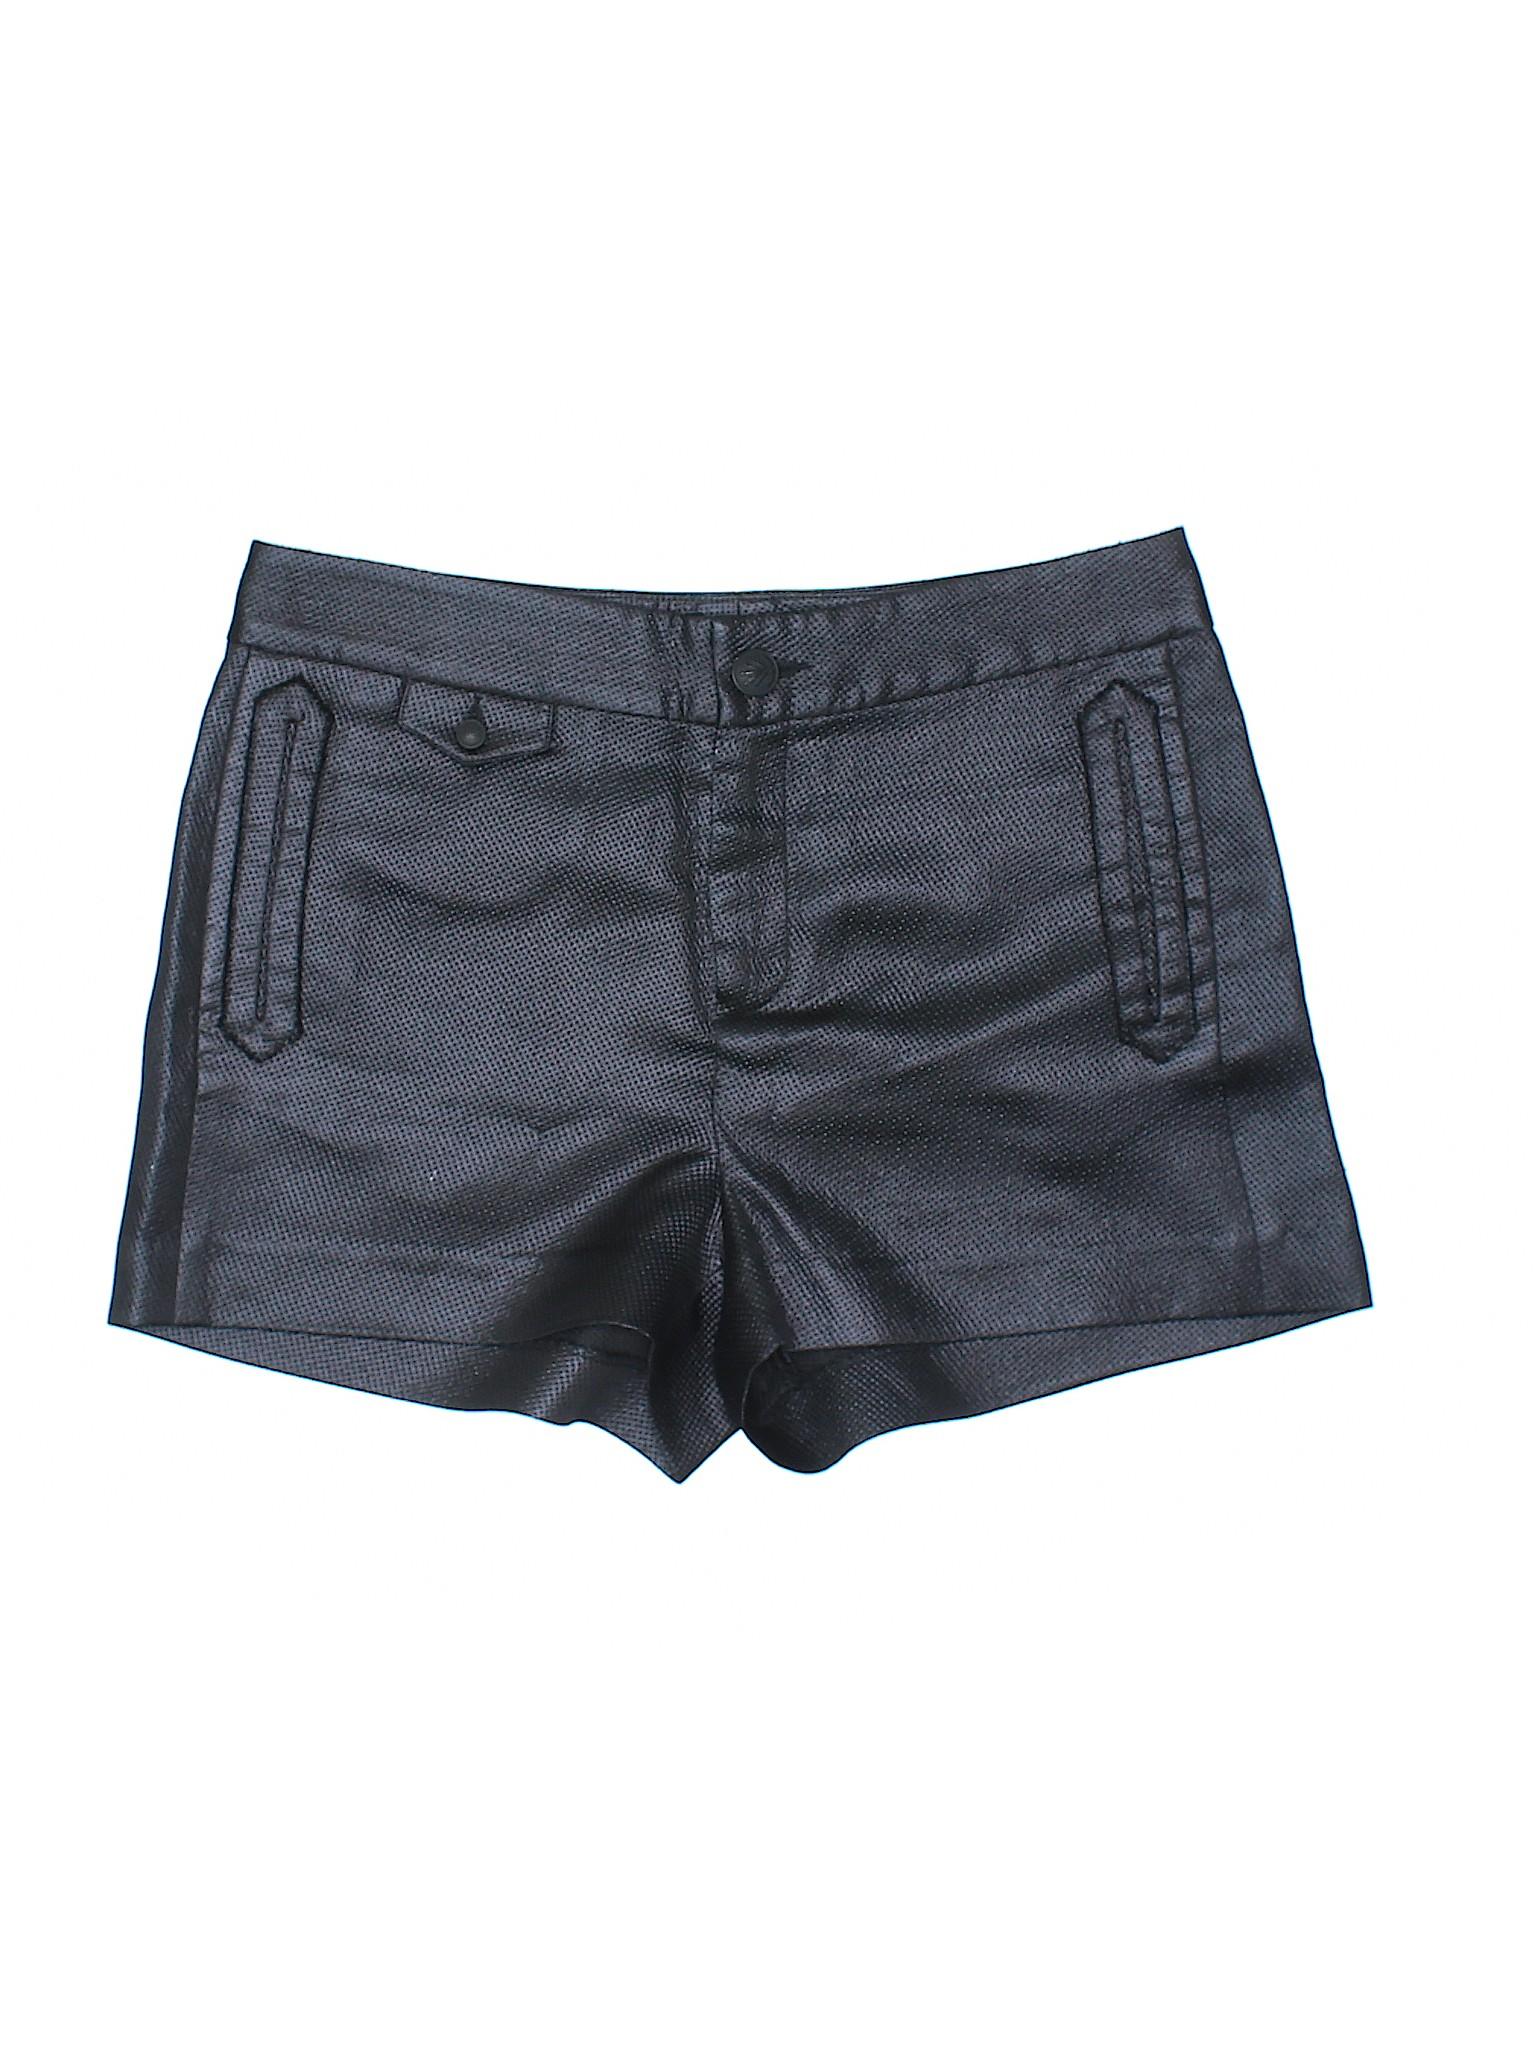 amp; Dressy Rag Bone Shorts Boutique wqYFP55